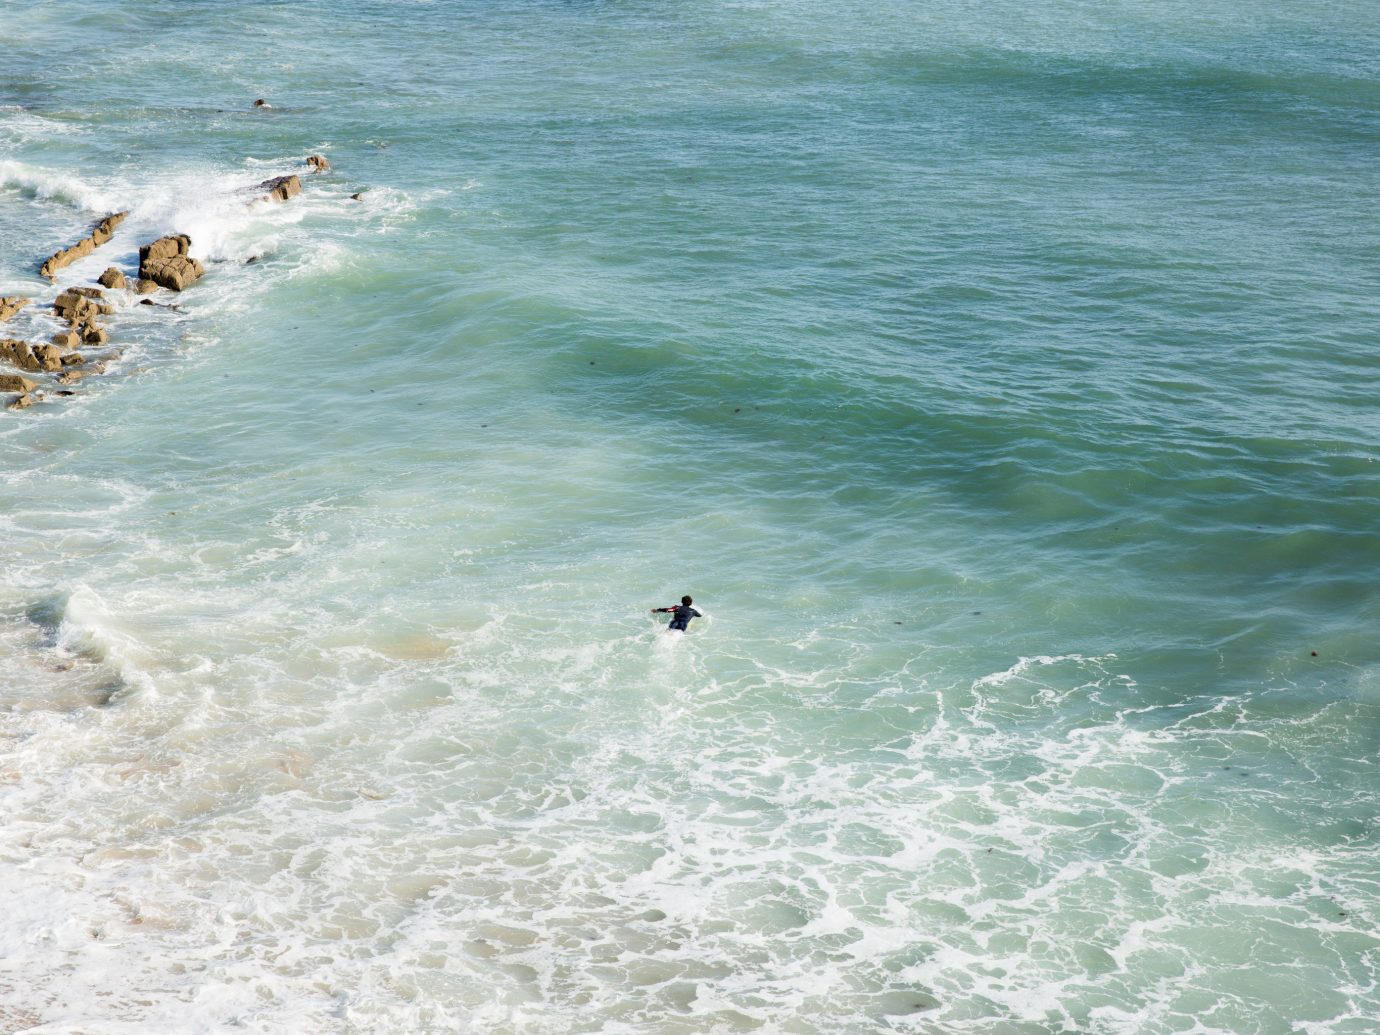 Trip Ideas water outdoor water sport surfing Sea Sport wave Beach wind wave shore Ocean body of water Coast cape sand bay